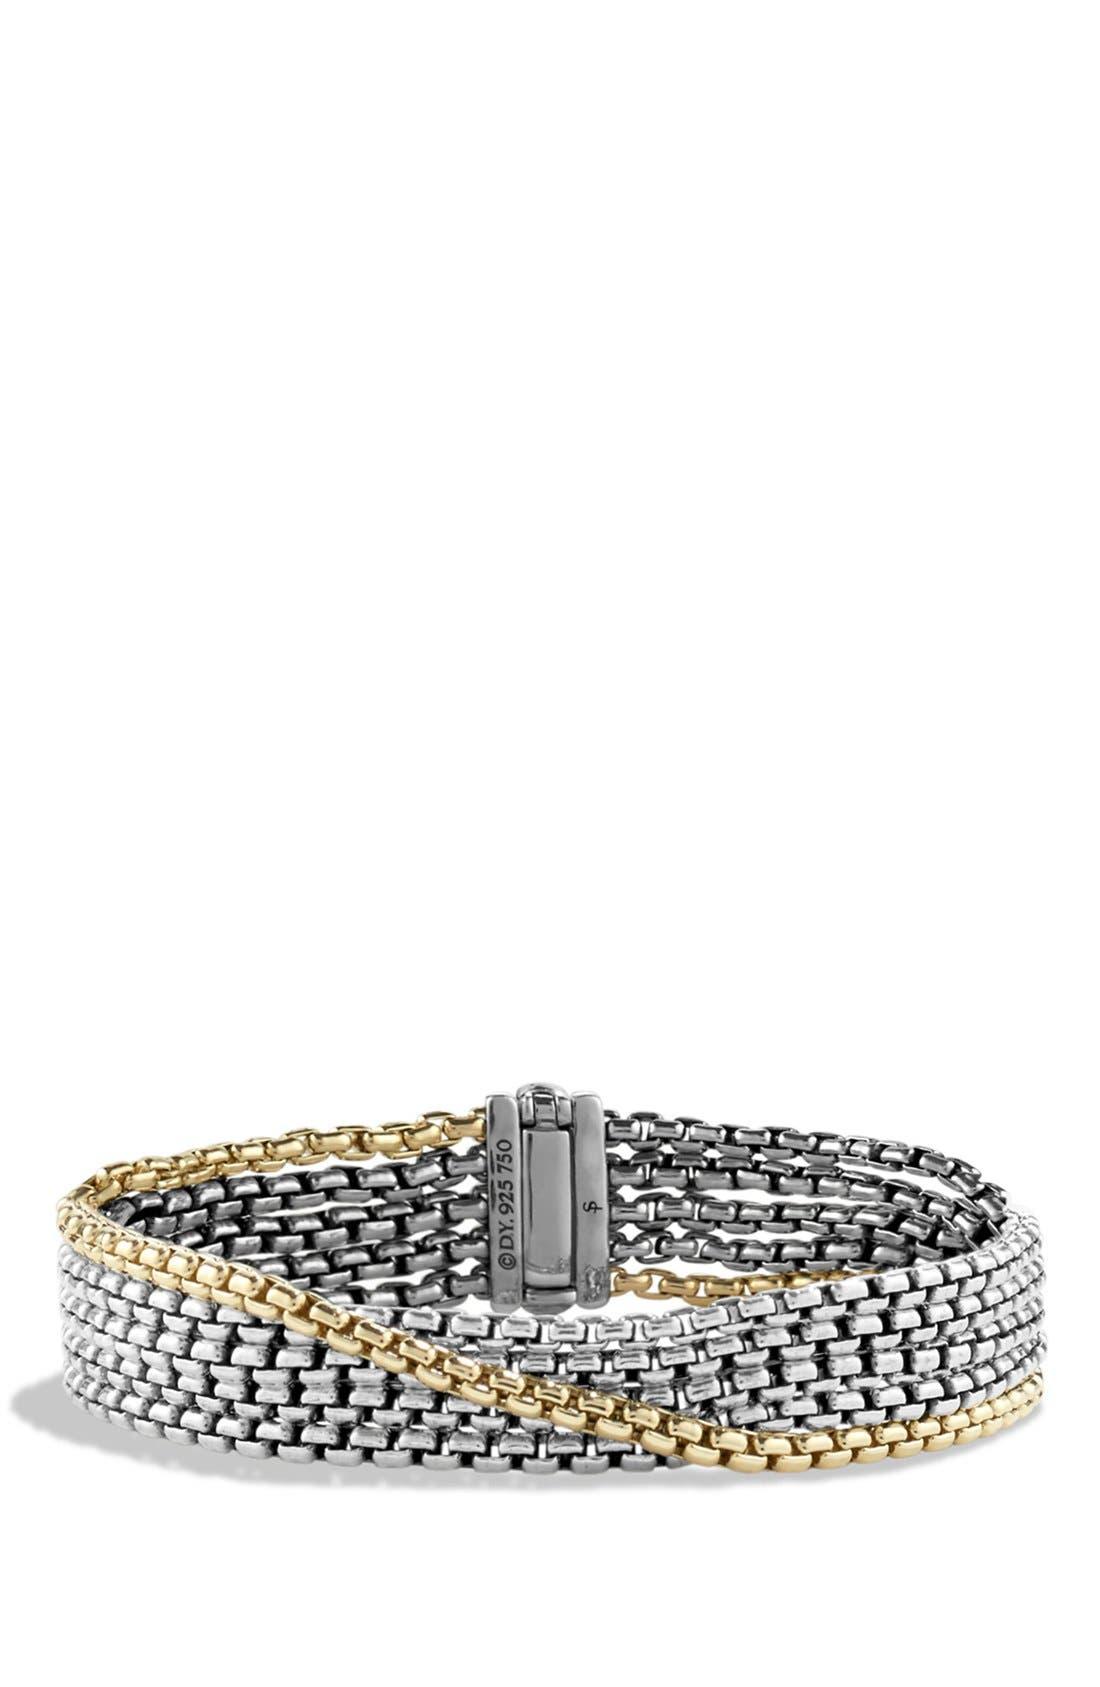 Alternate Image 1 Selected - David Yurman 'Chain' Box Chain Five-Row Bracelet with Gold